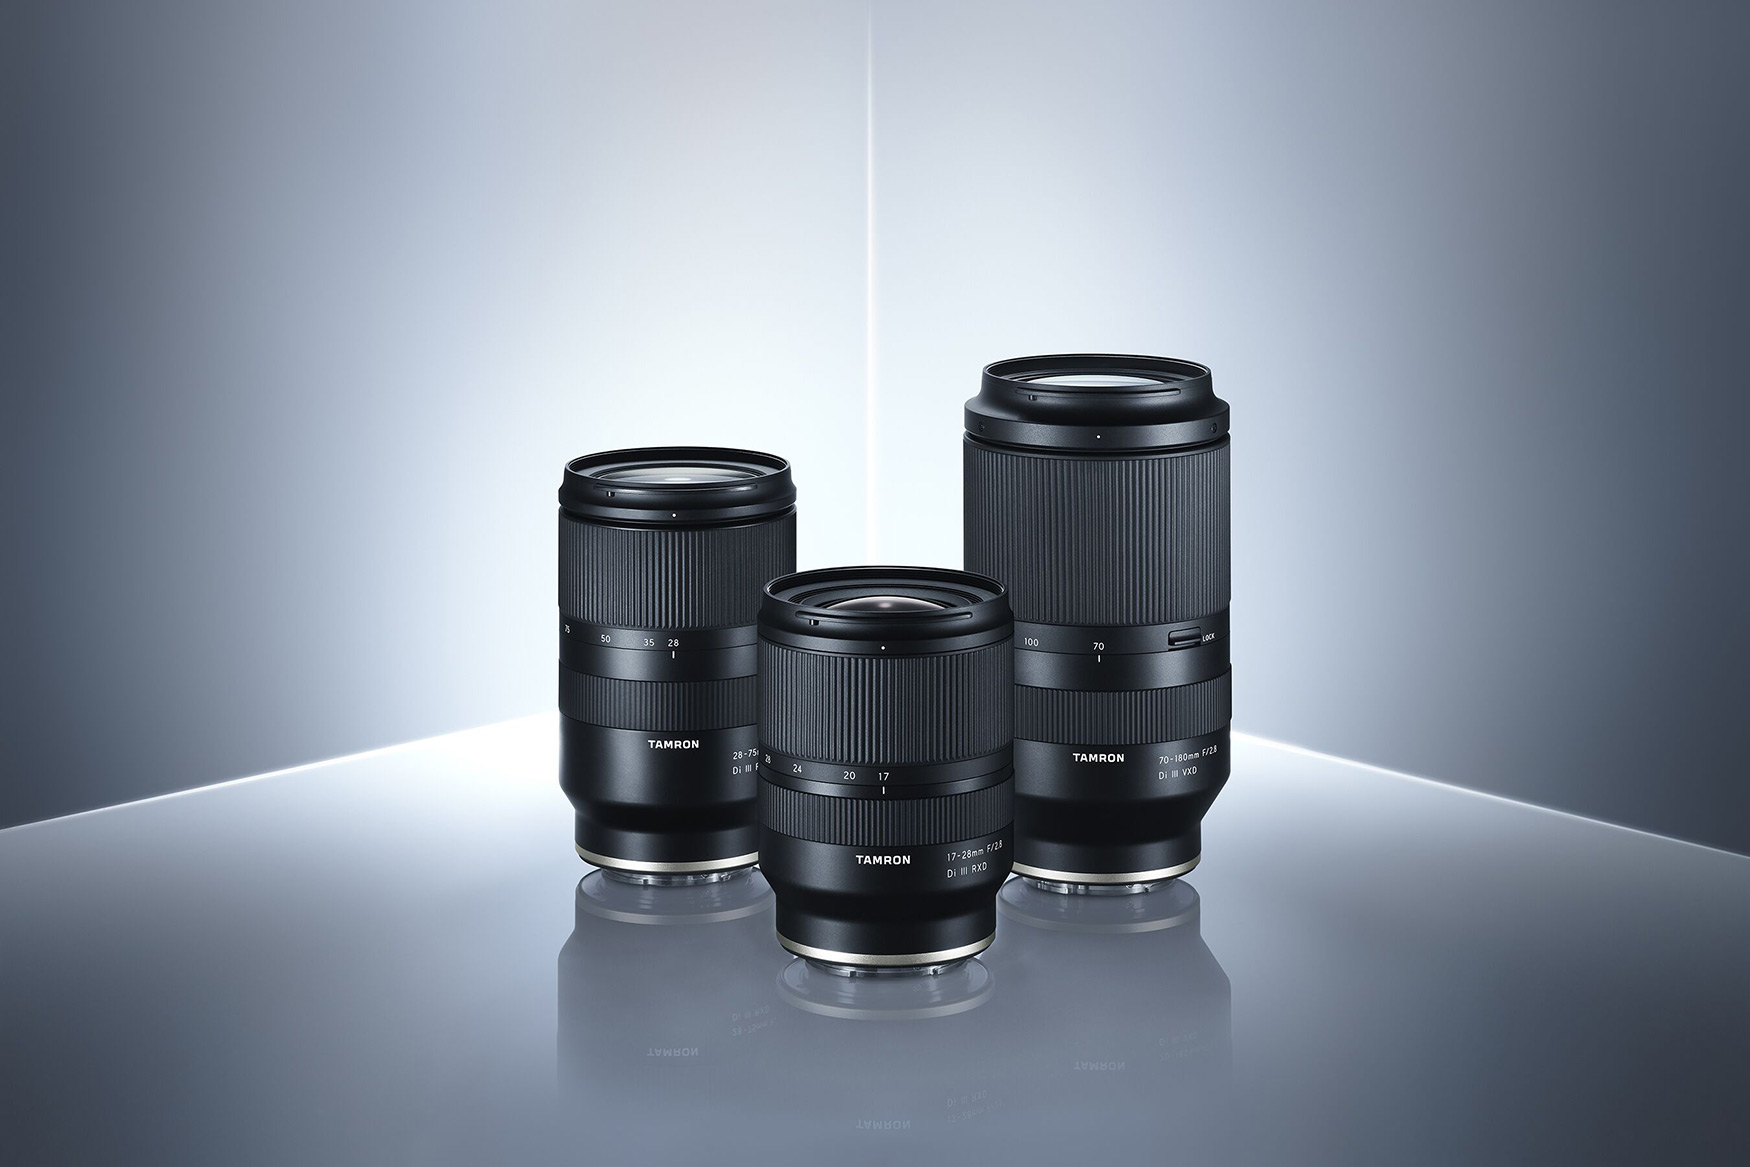 Tamron 70-180 mm f/2.8 Di III VX